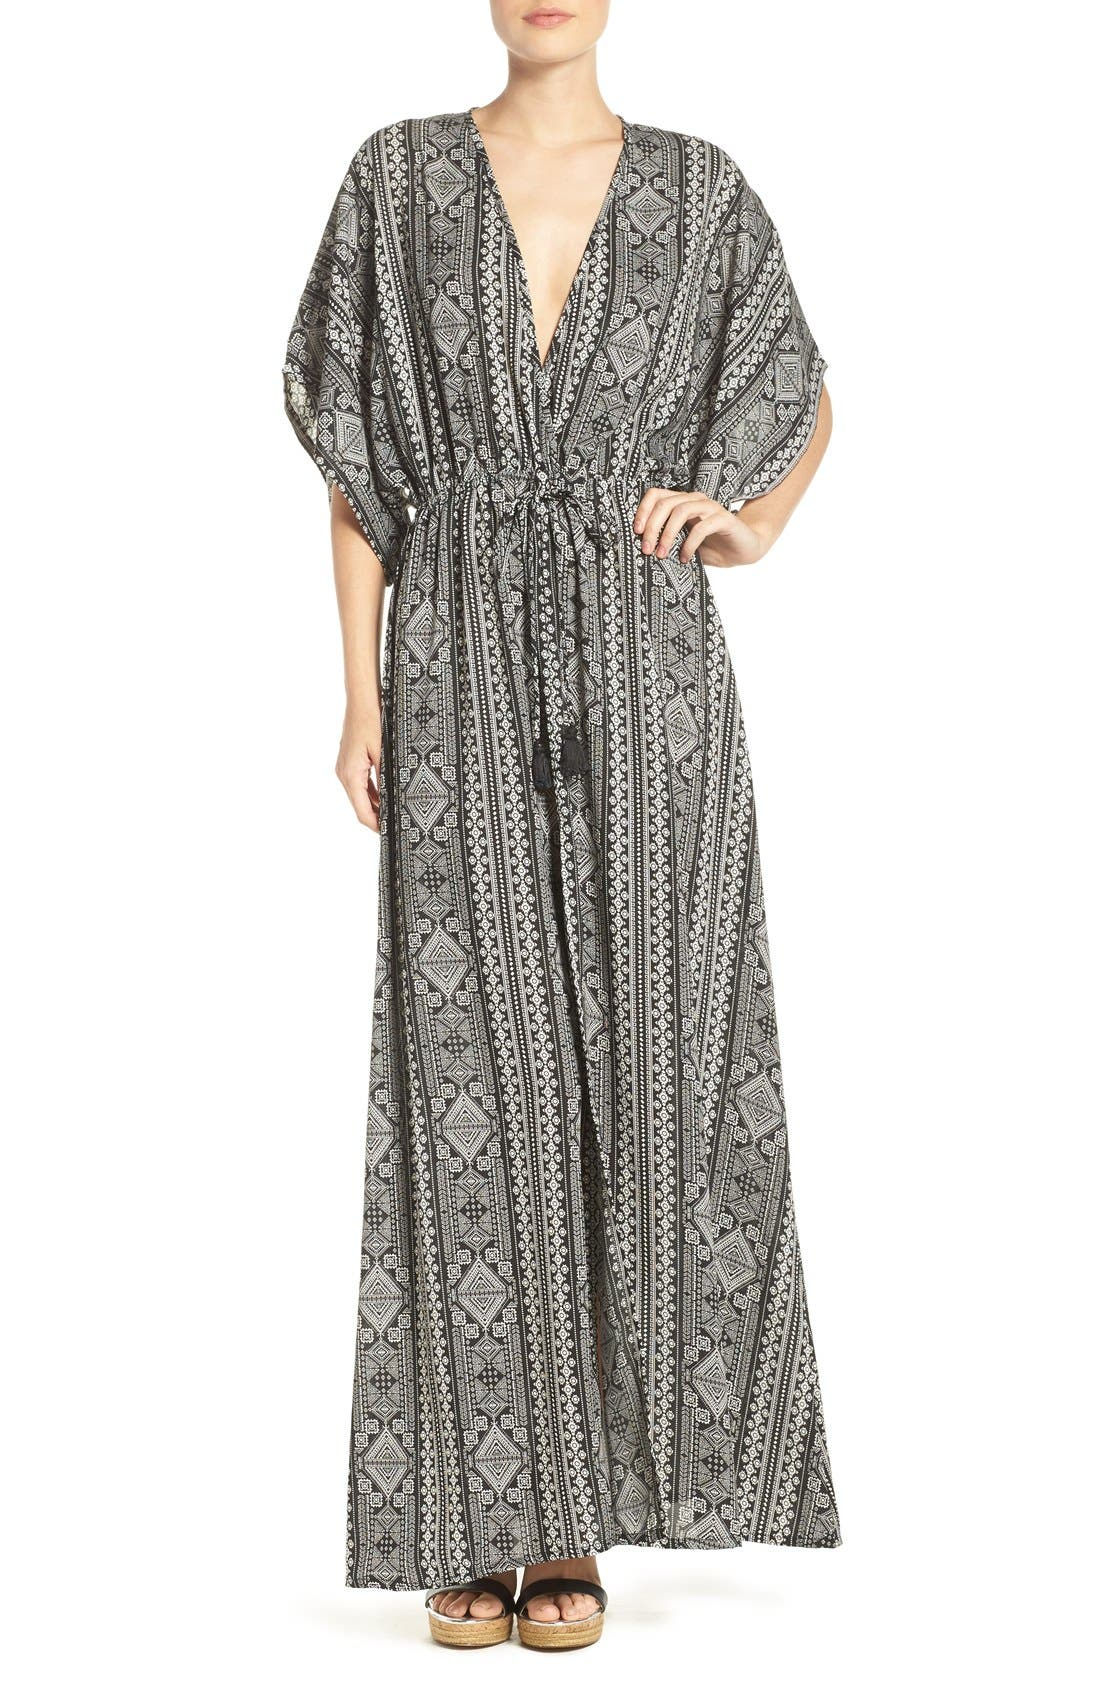 Main Image - ElanPrint Woven Cover-Up Caftan Maxi Dress